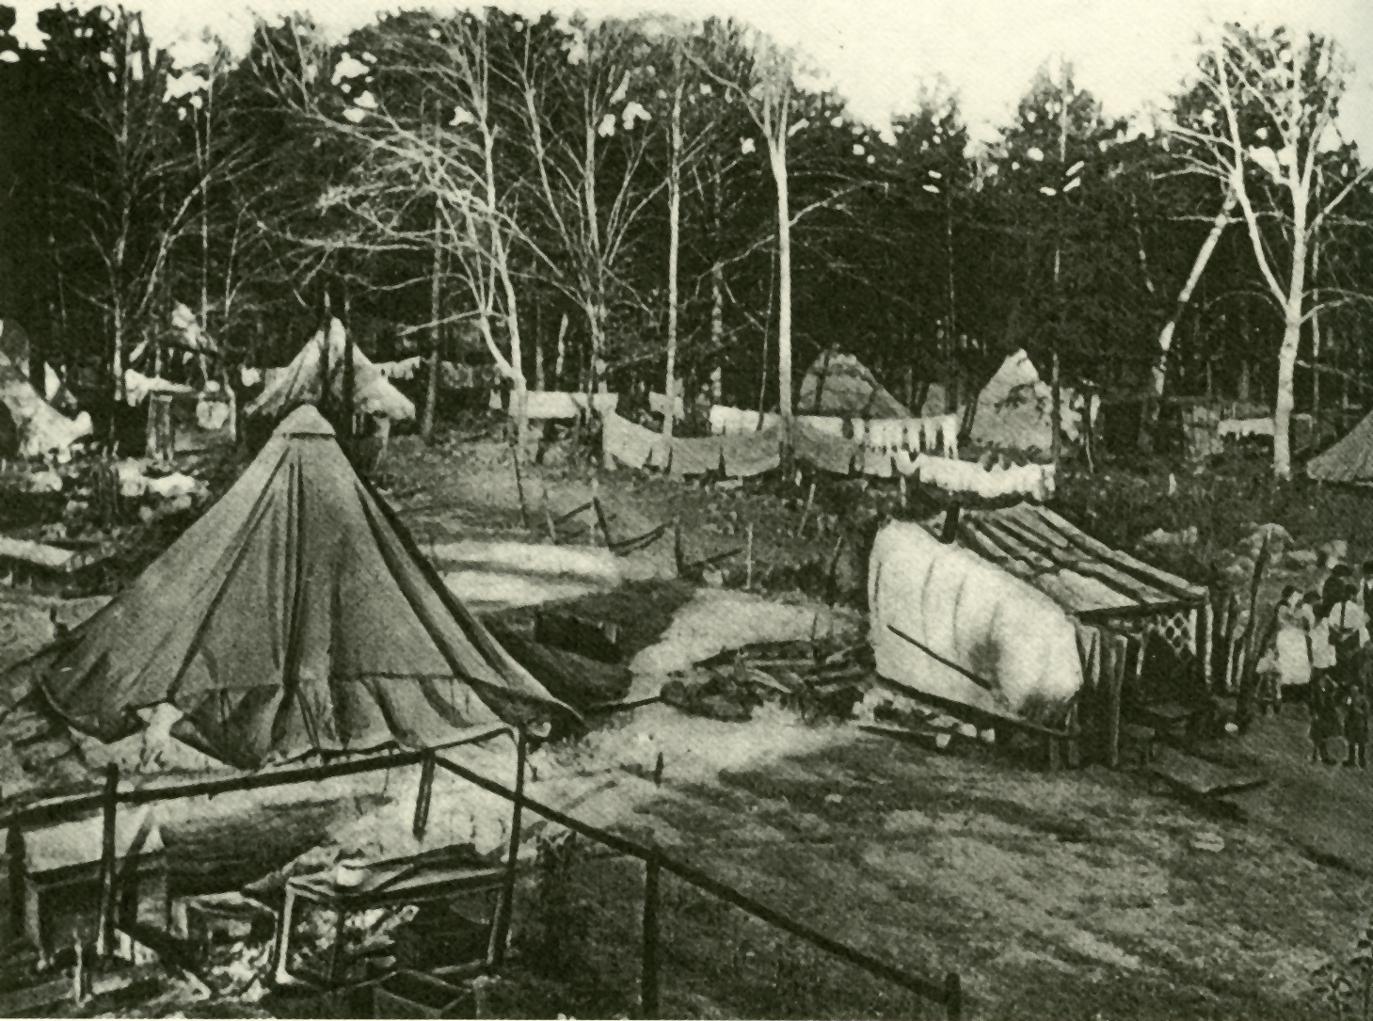 Image of tents makeshift kitchens and miners. & ExplorePAHistory.com - Image